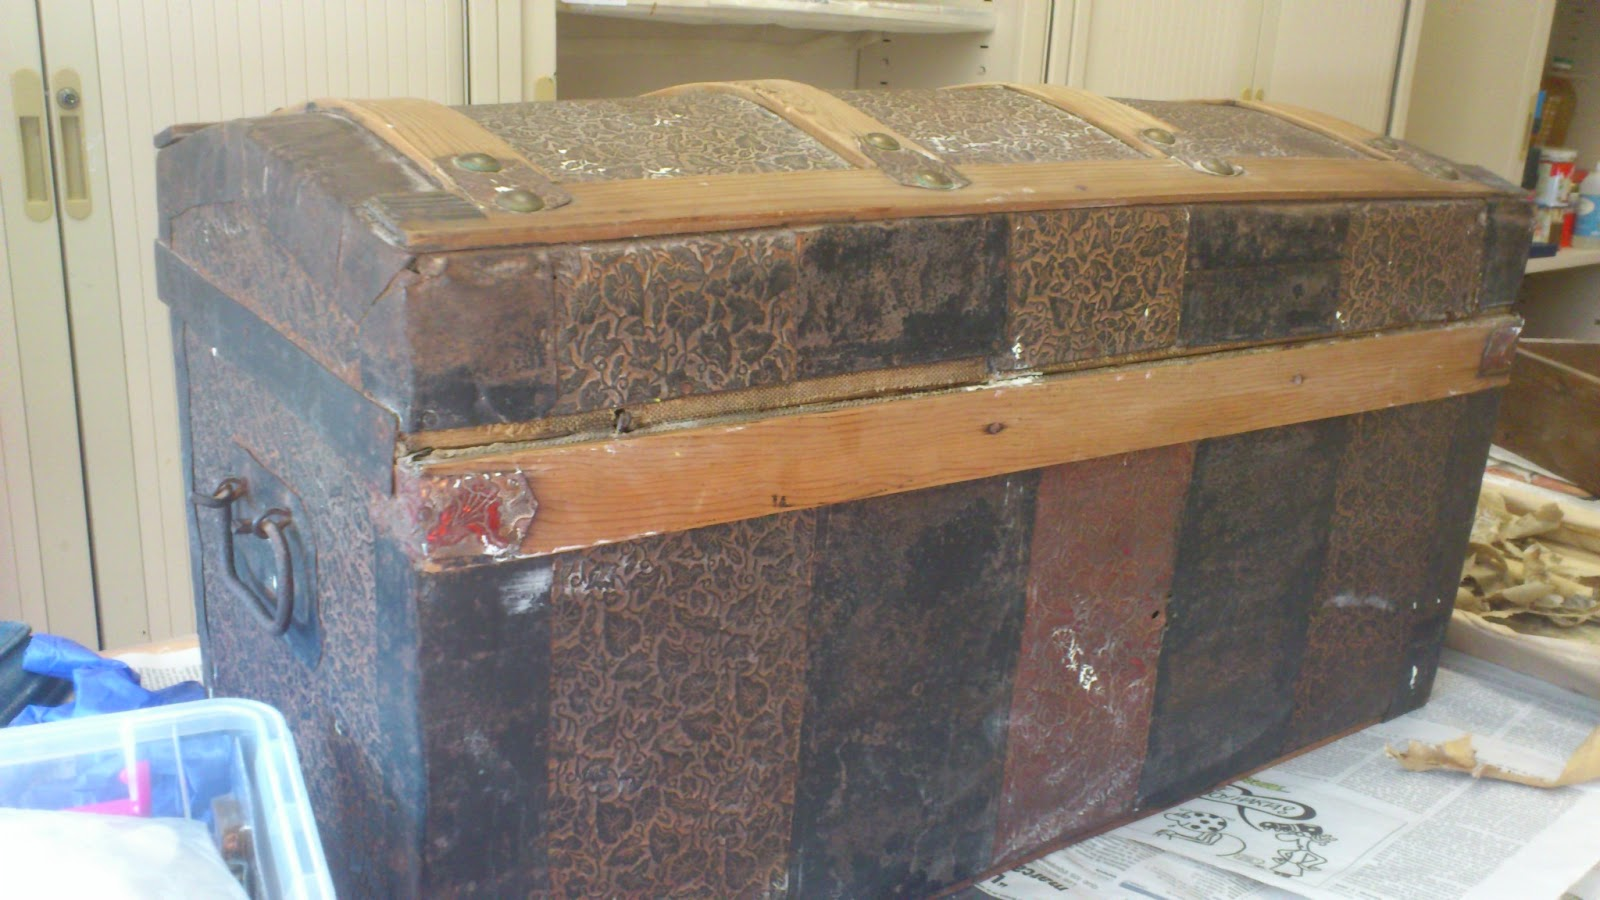 Madera de mindi restaurando aquel ba l antiguo - Como limpiar muebles de madera antiguos ...